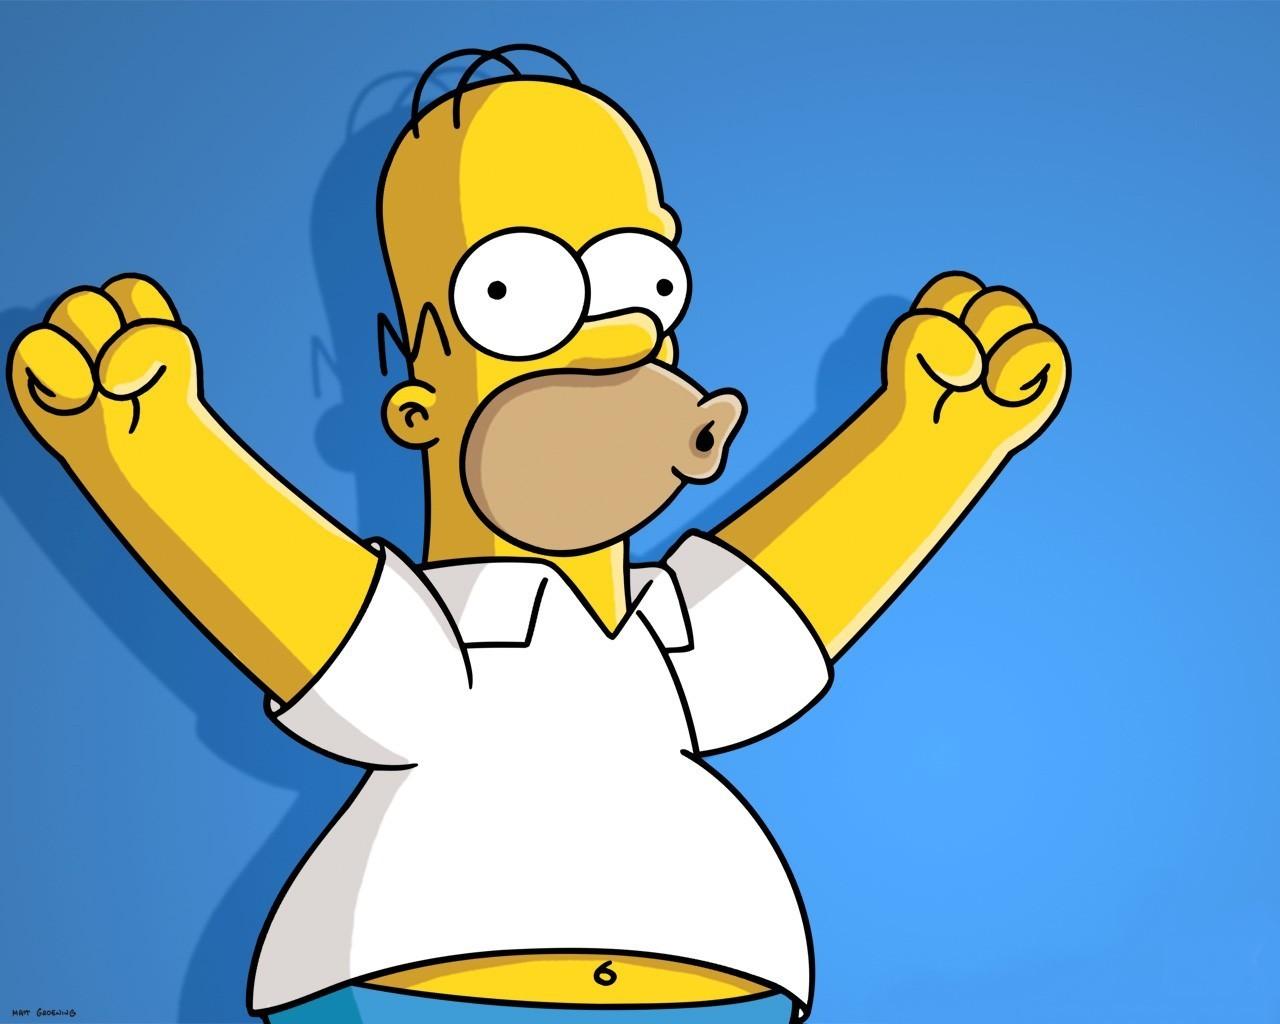 Megapost:Frases de los personajes de Los Simpsons